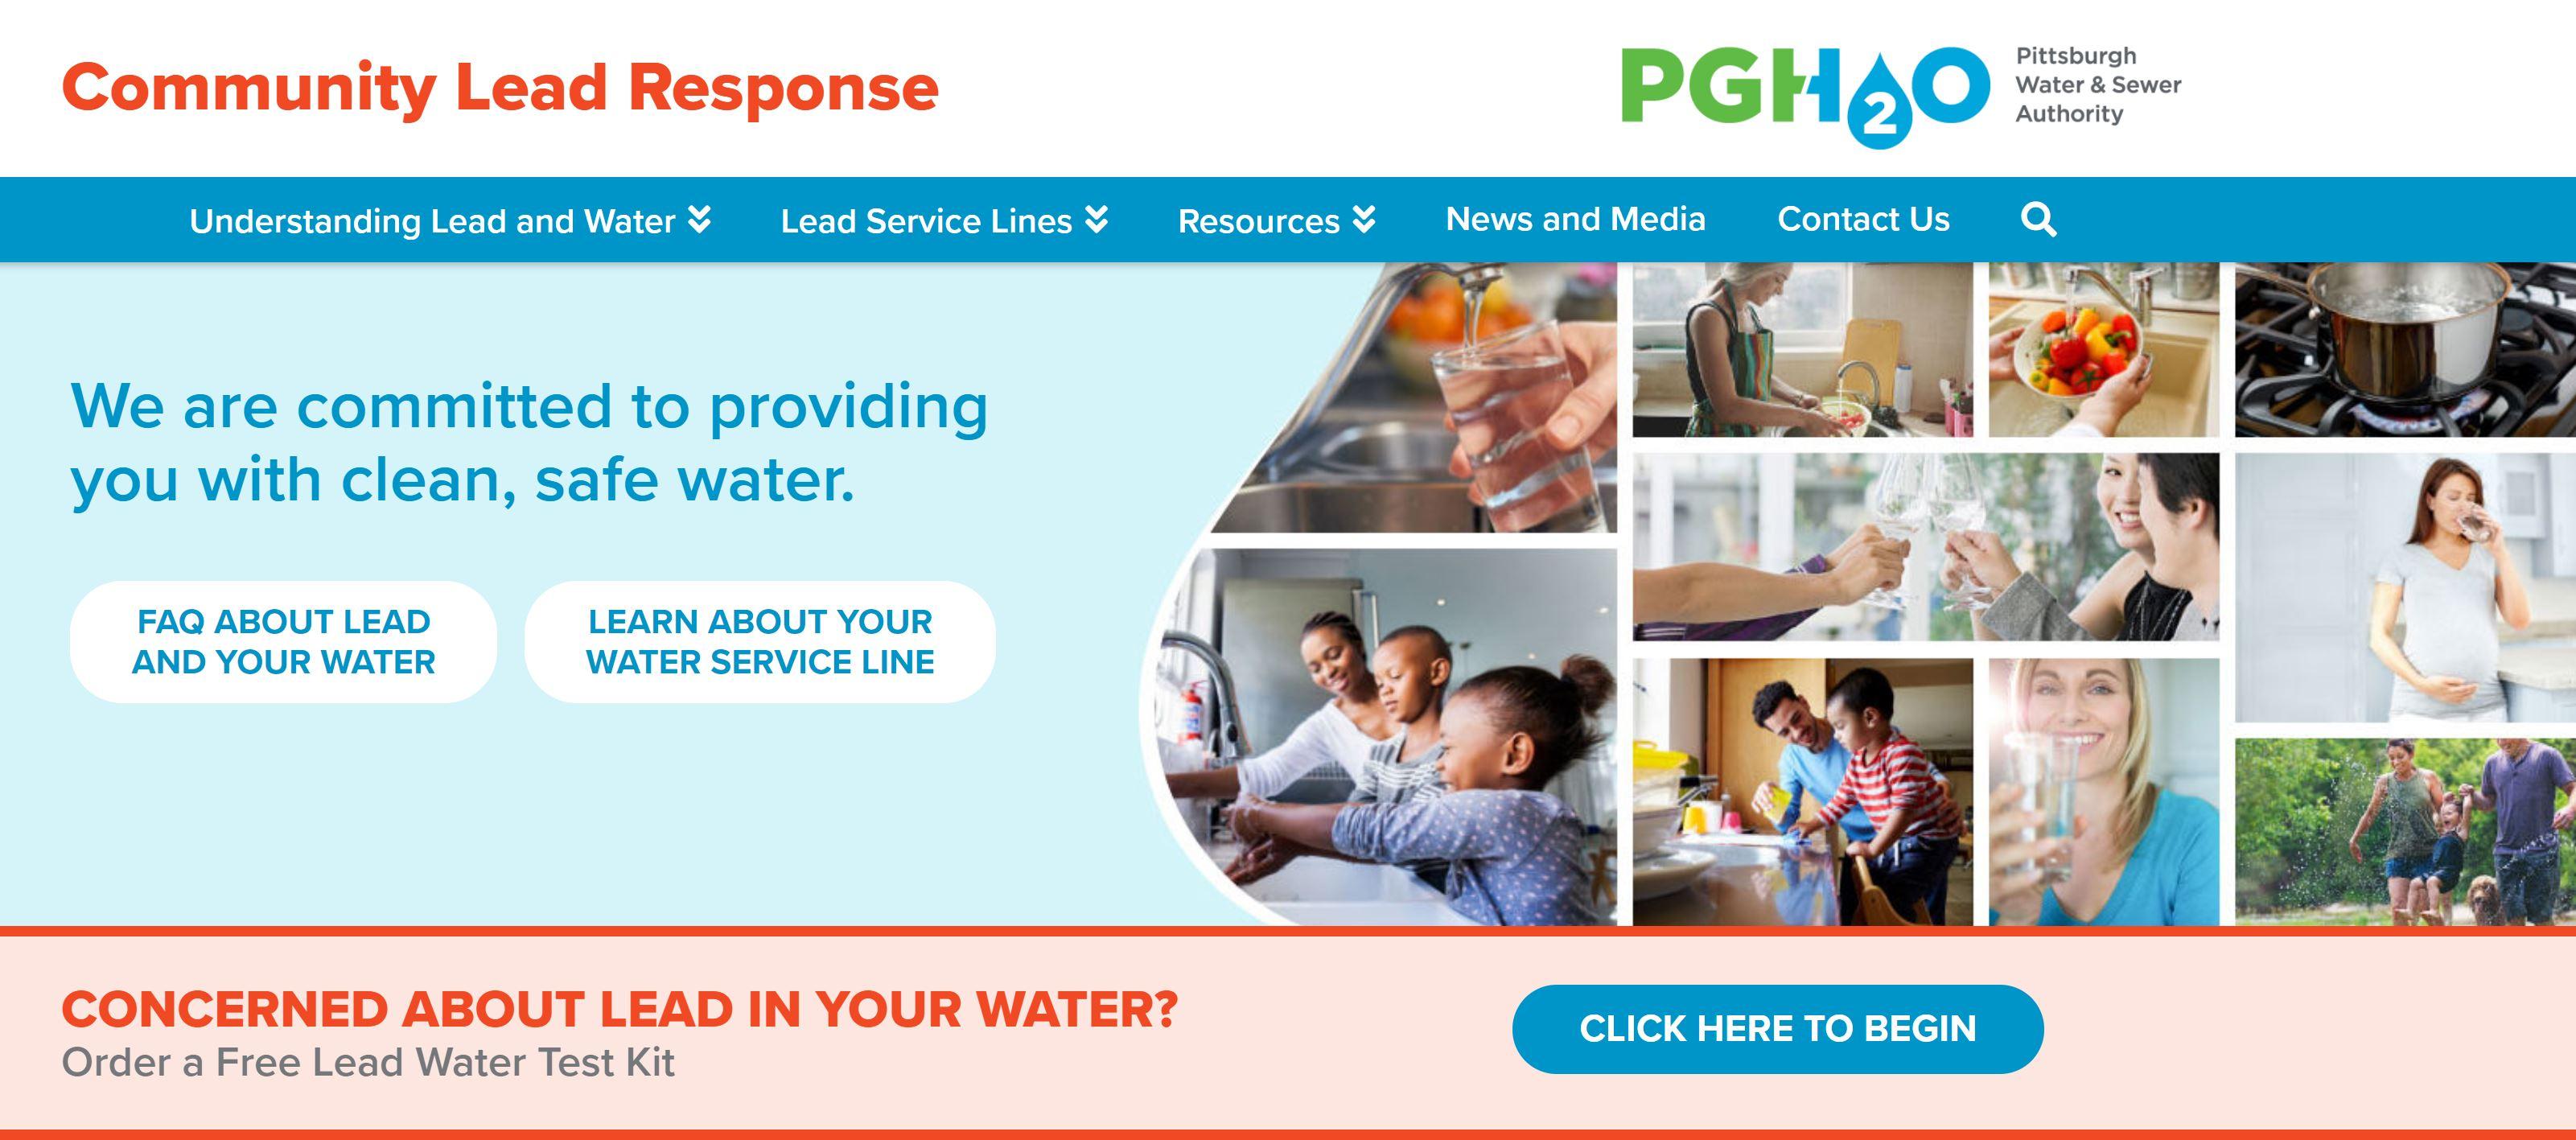 Screen-capture of Lead microsite homepage